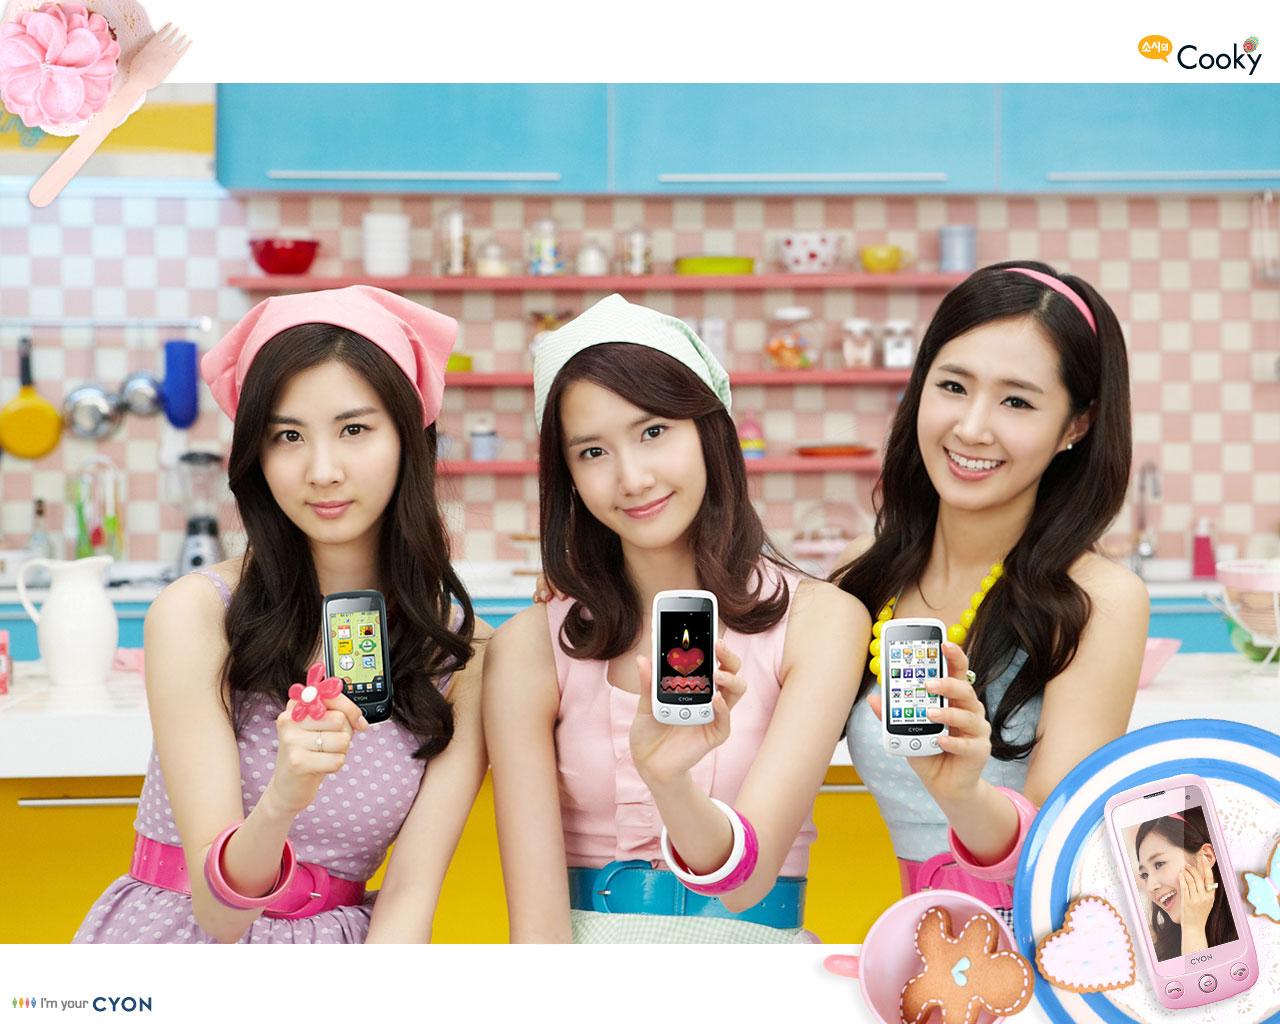 http://1.bp.blogspot.com/-VYn6w6xXjwk/TpzDZK09vDI/AAAAAAAAAG0/VdMST5gKINQ/s1600/korea-snsd-236-cyon-cooky.jpg